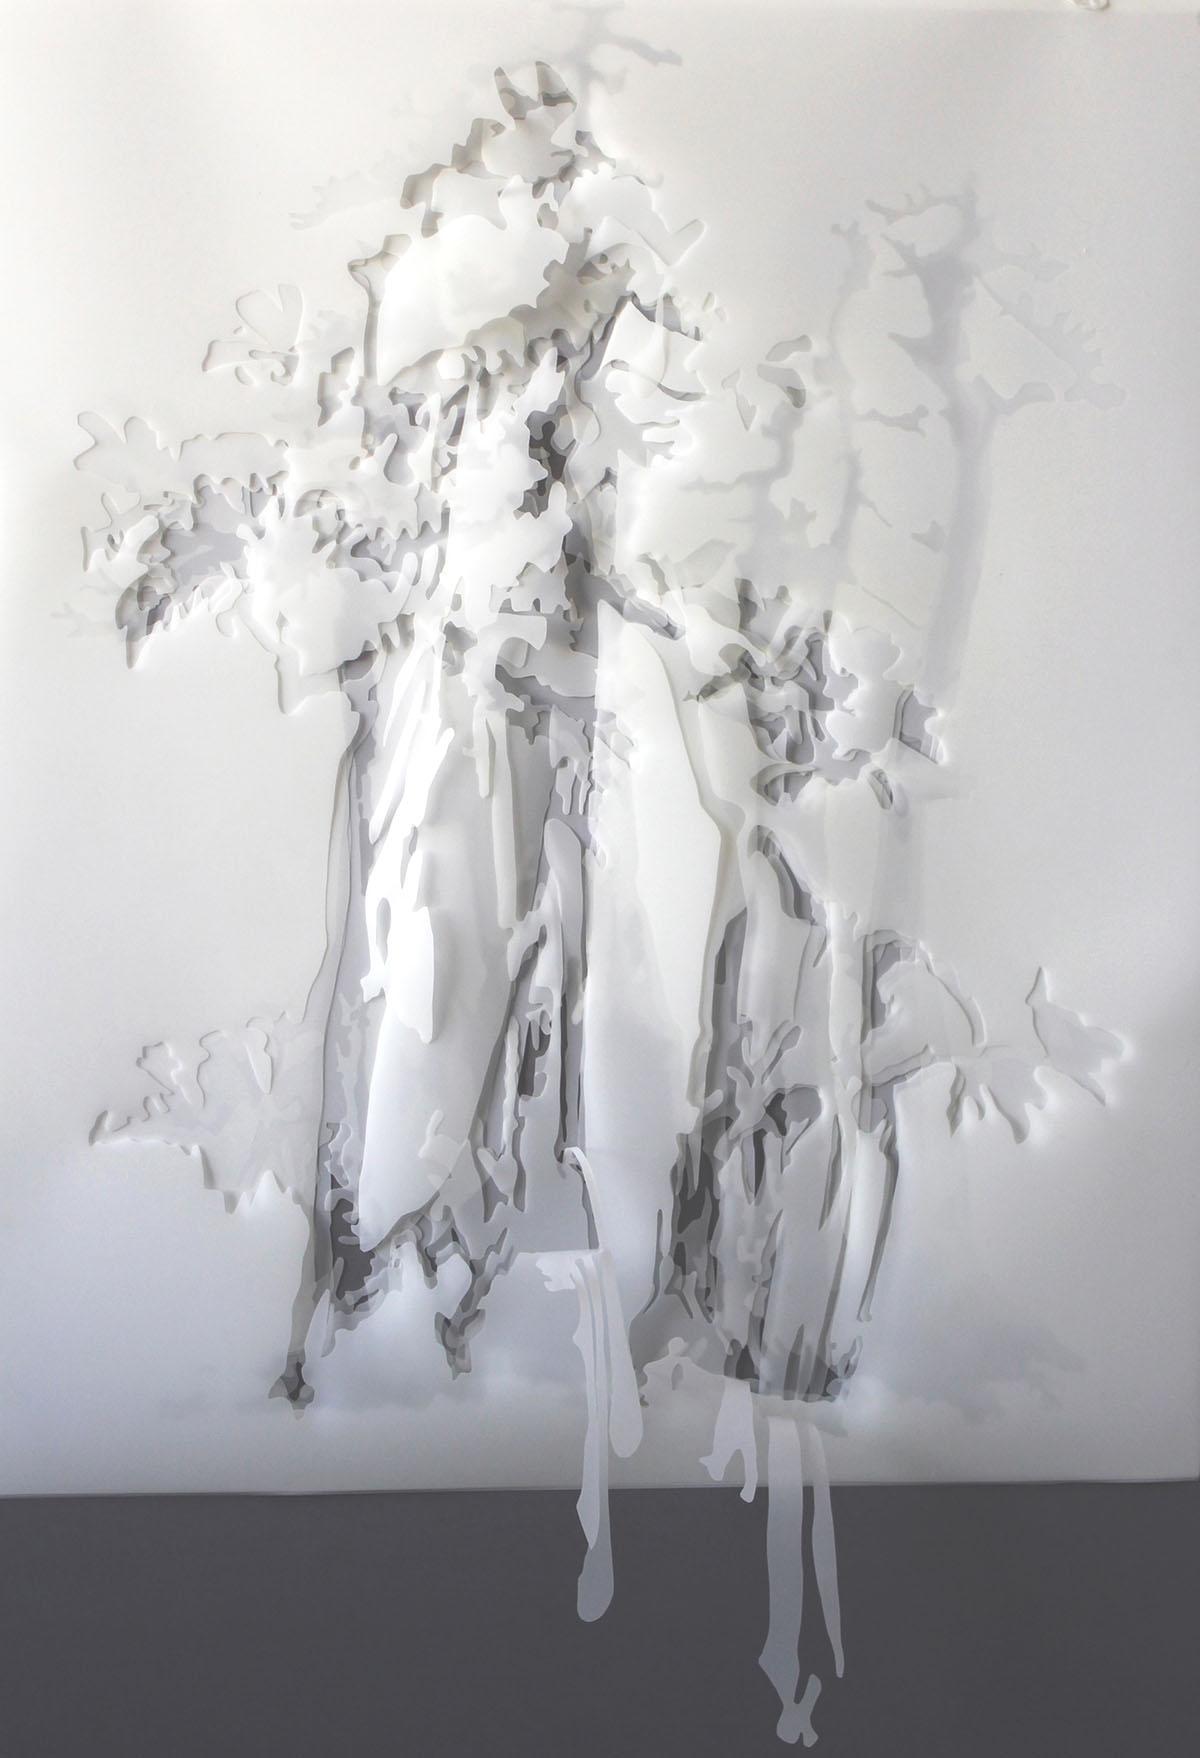 Kim_Kyong_Wildwood-2,-42'x36',-Hand-Cut-Drafting-Film